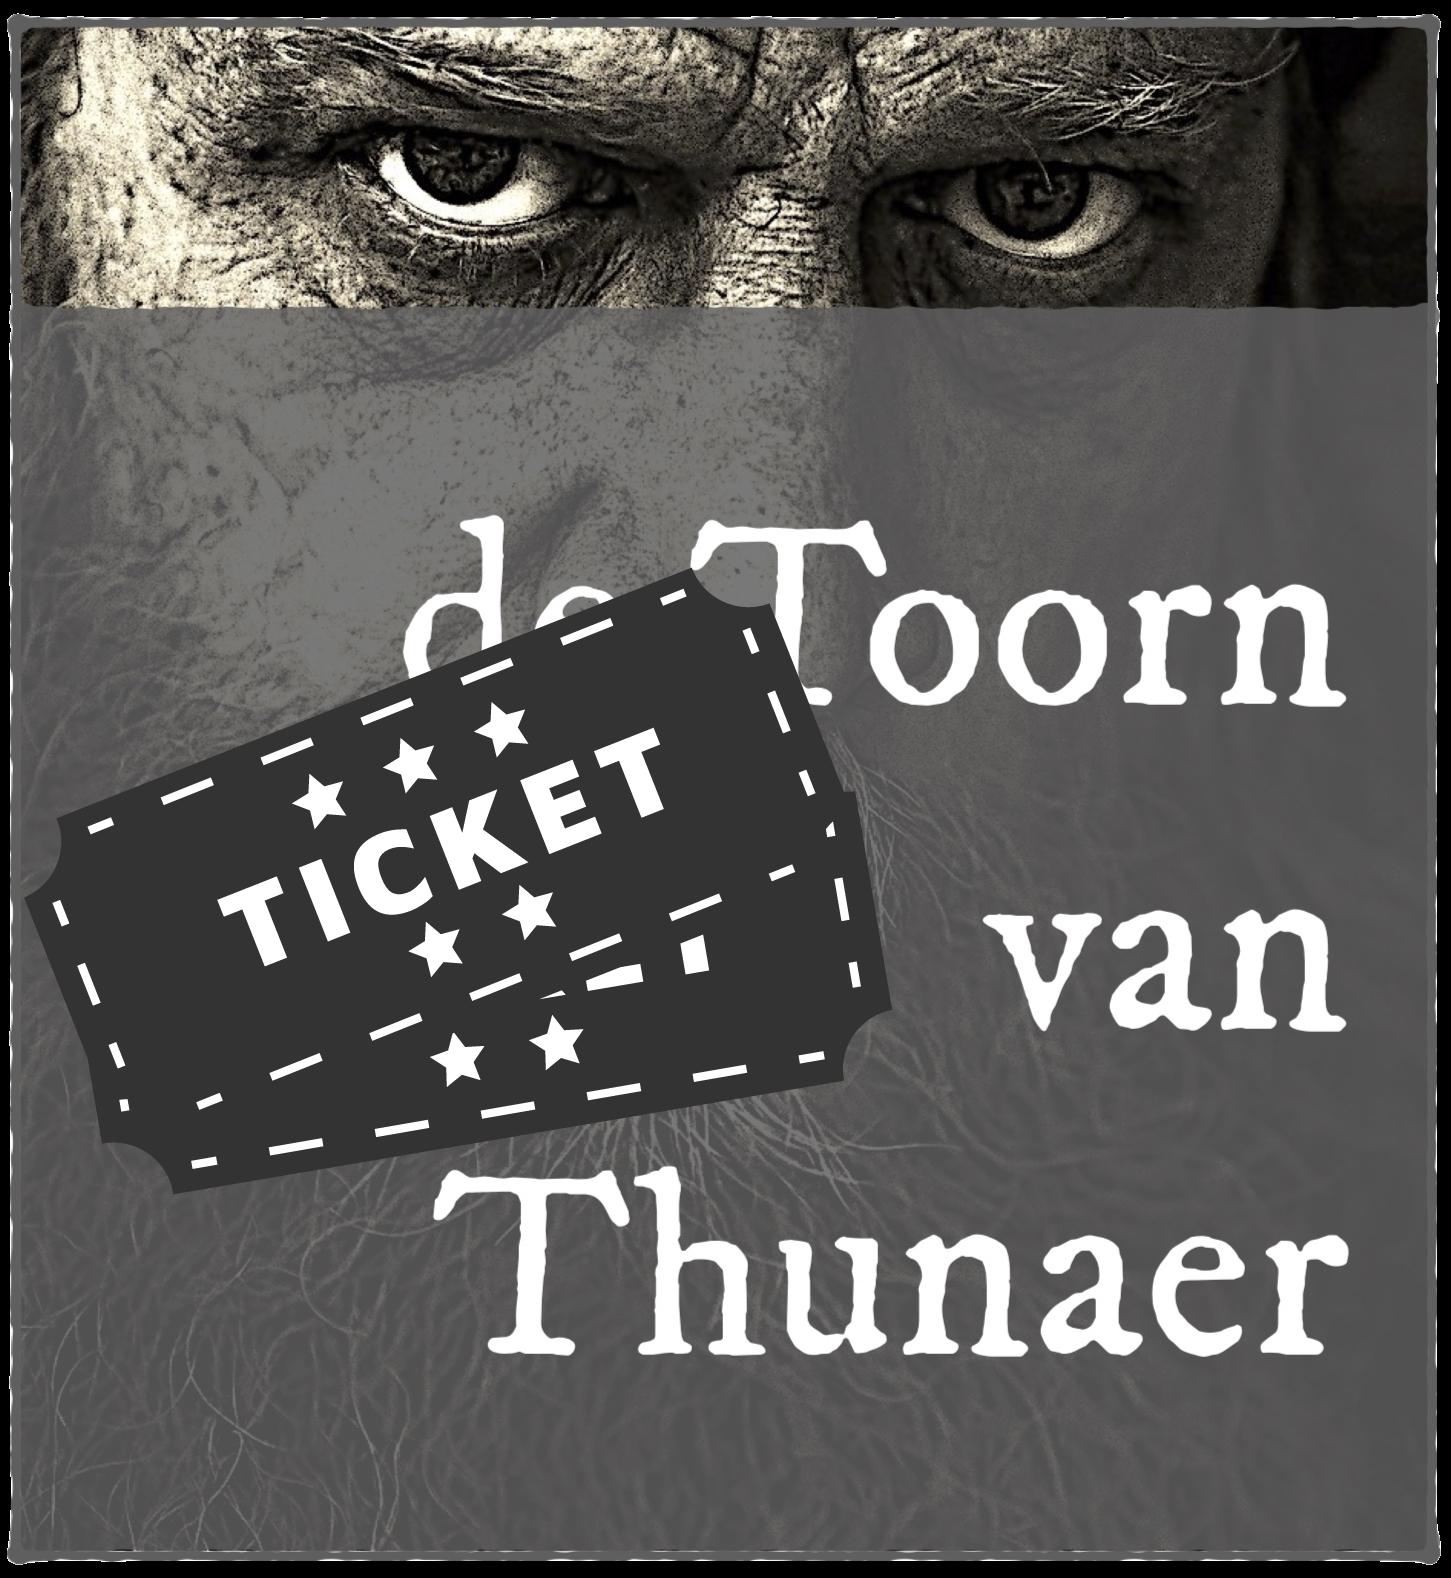 Toorn van Thunaer ticketverkoop